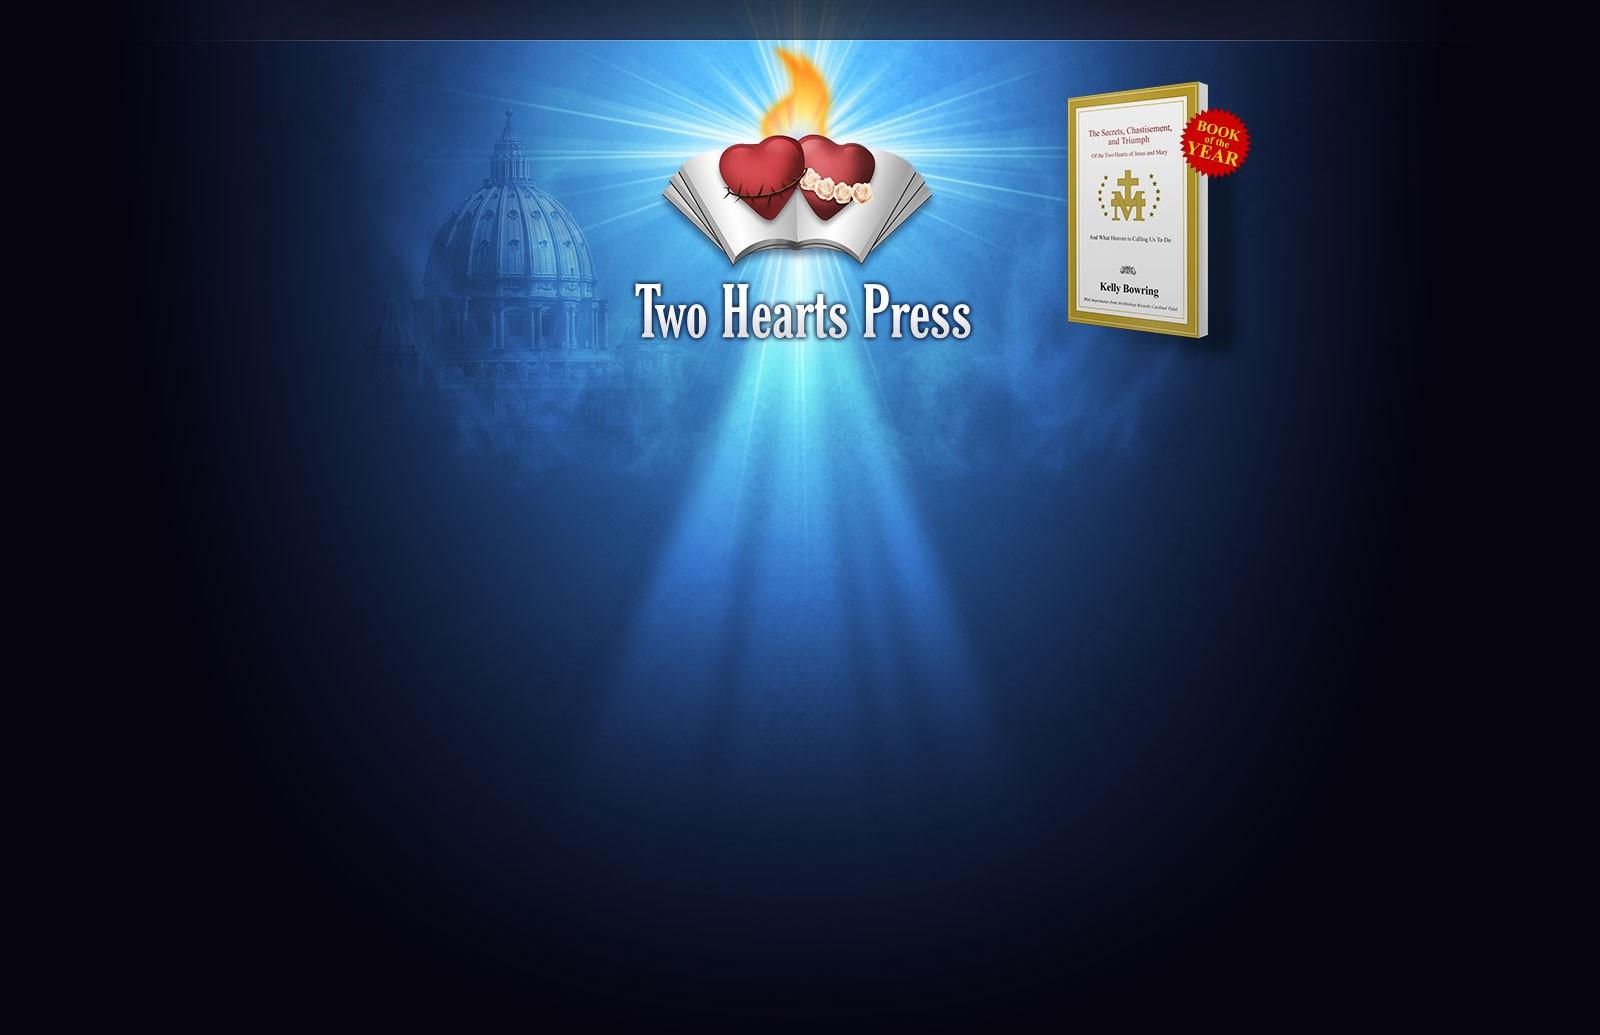 Two Hearts Press